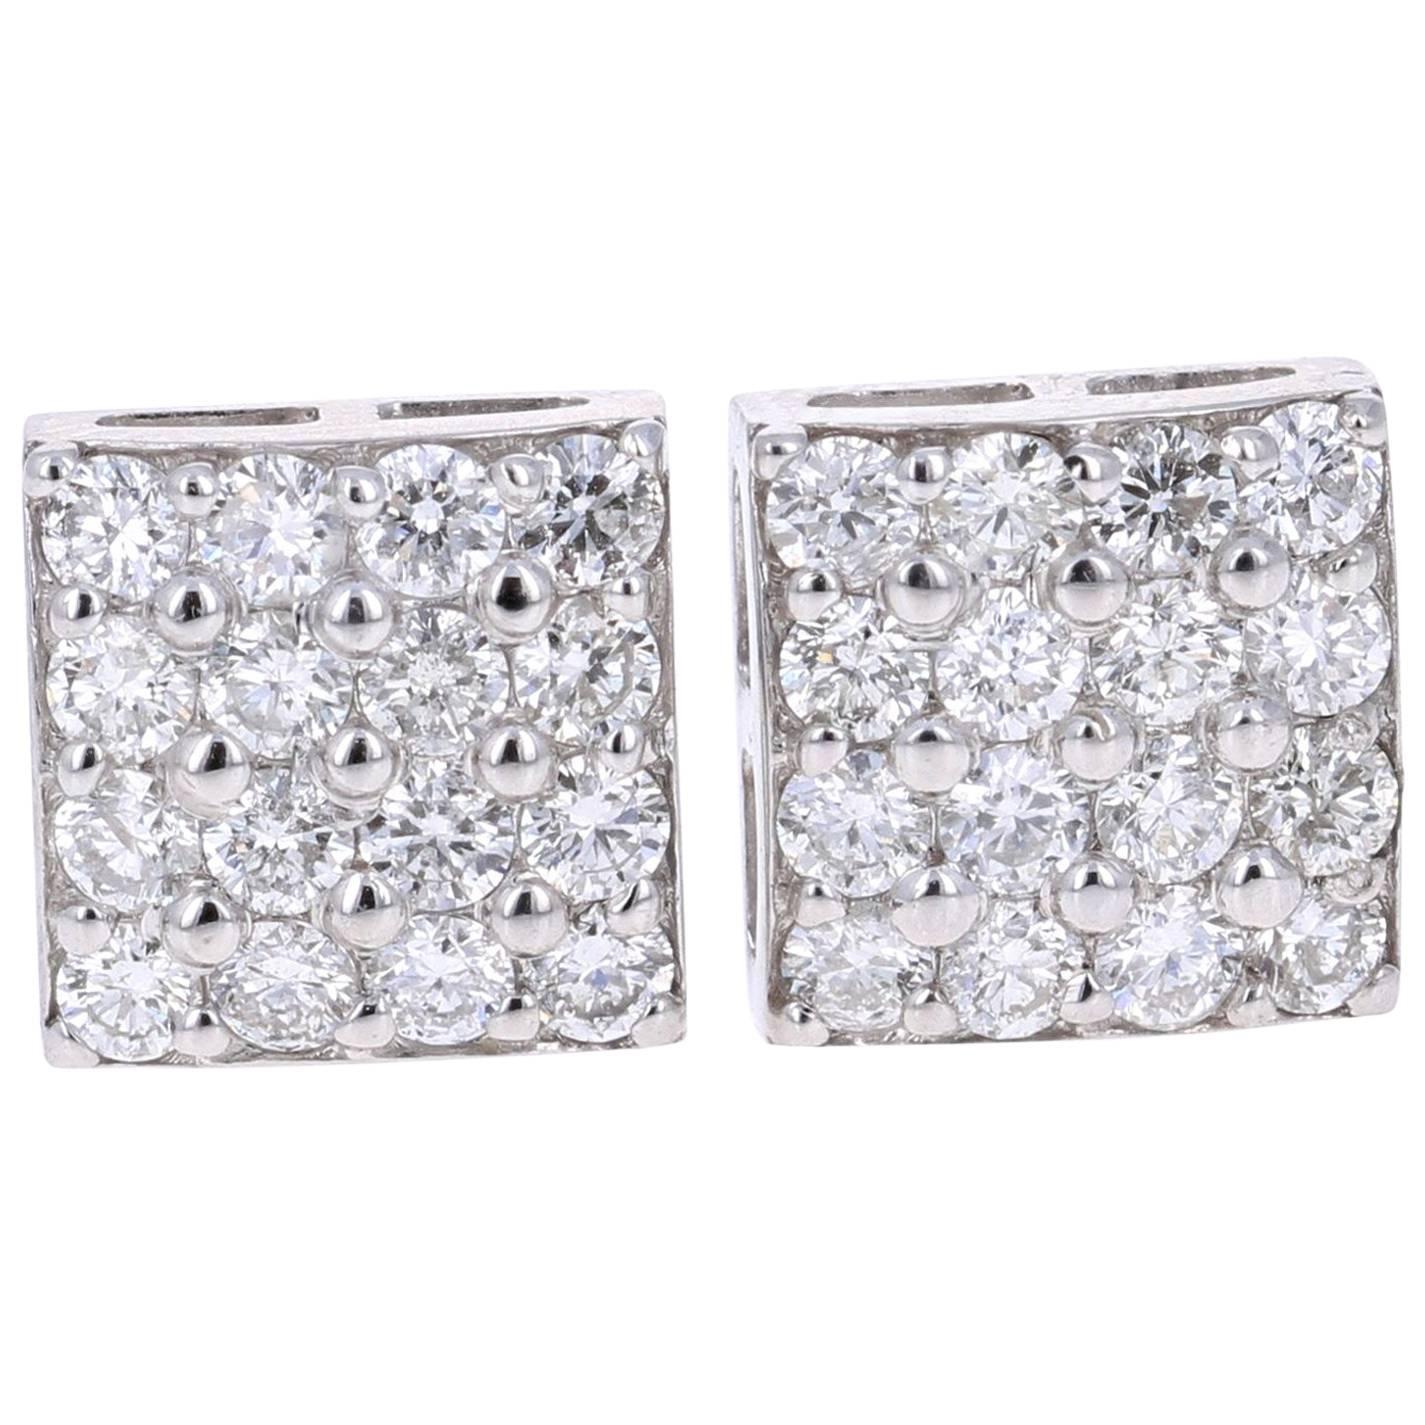 1.30 Carat Round Cut Diamond 14K White Gold Stud Earrings